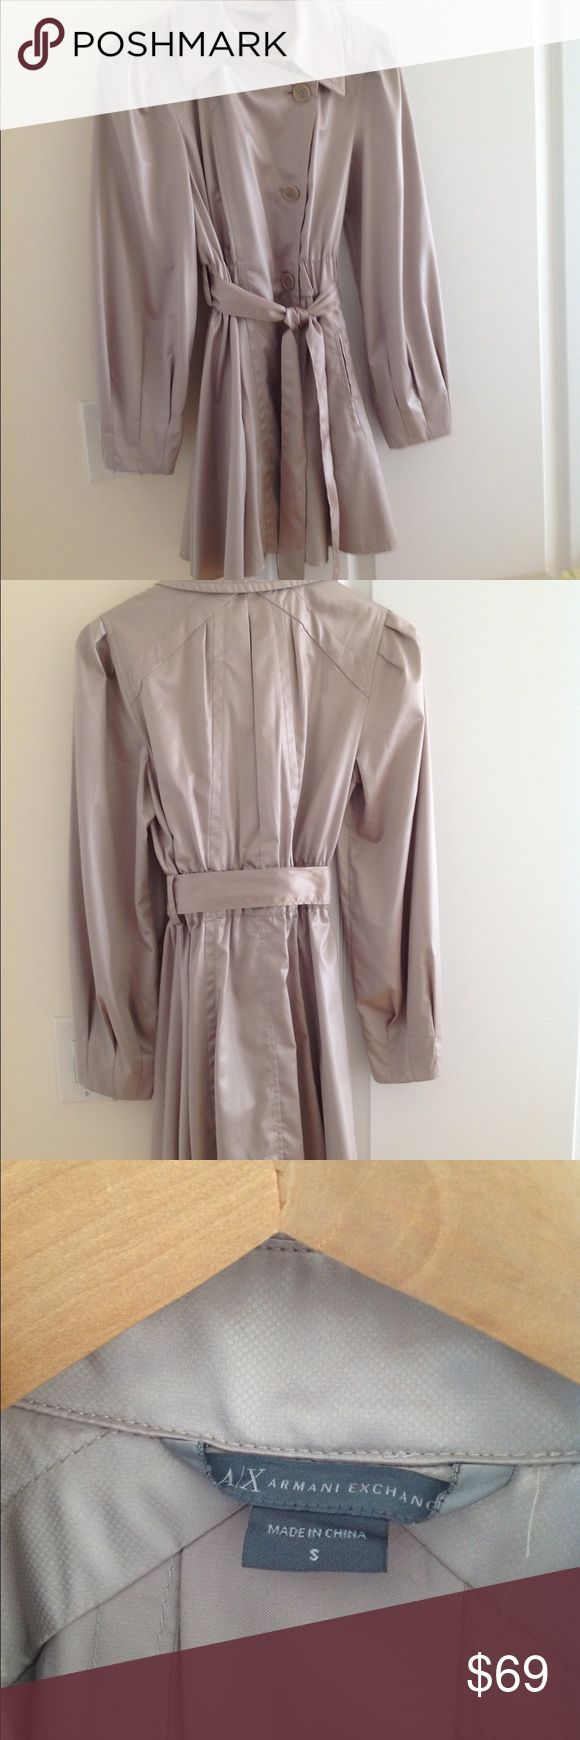 Selling this Armani Exchange coat. Size S. on Poshmark! My username is: mary_ru. #shopmycloset #poshmark #fashion #shopping #style #forsale #A/X Armani Exchange #Jackets & Blazers